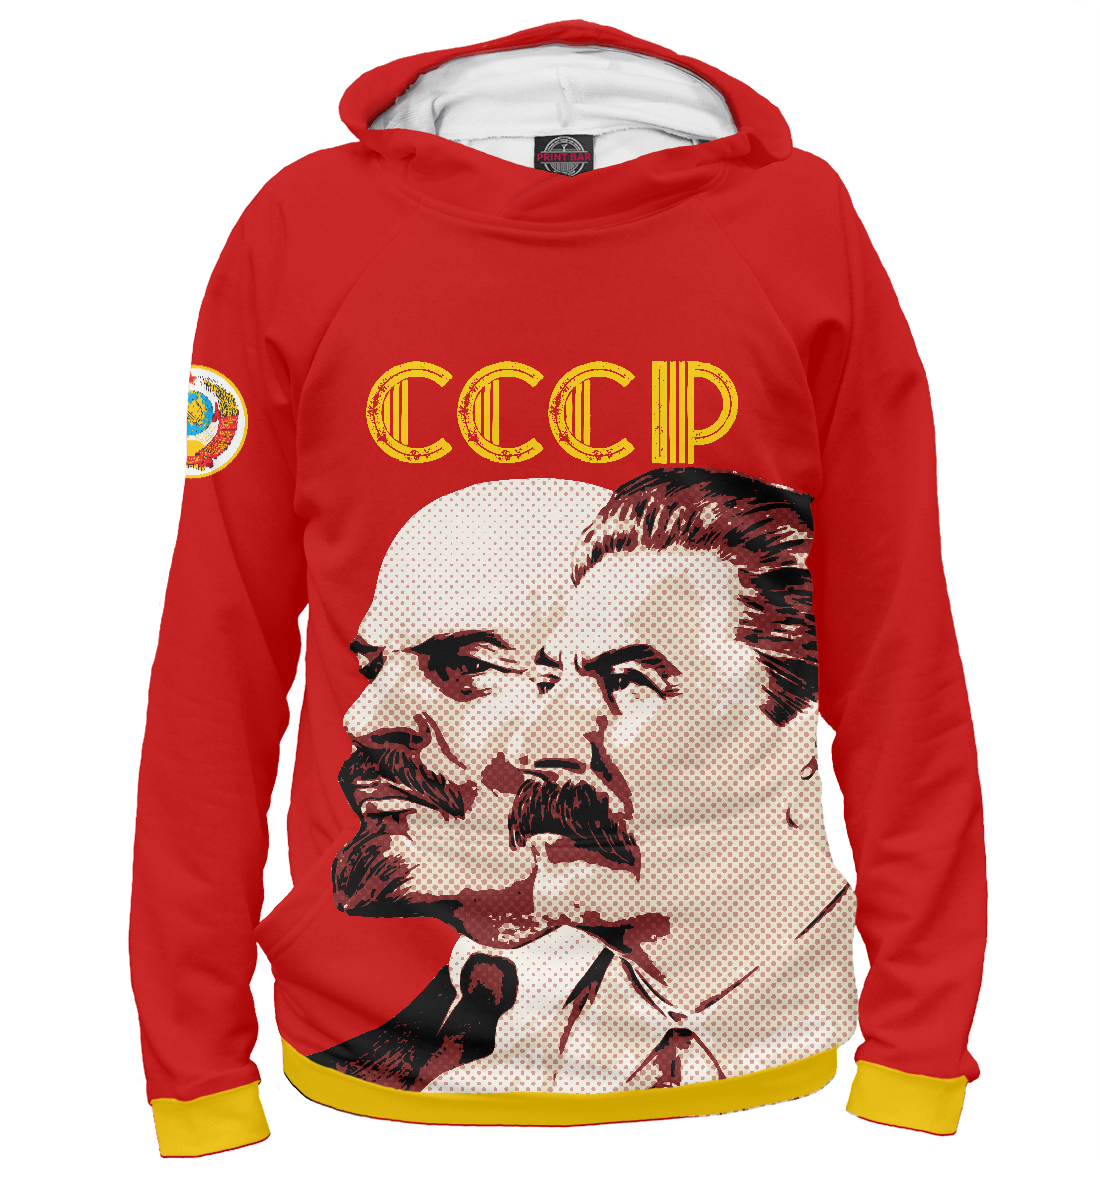 Ленин - Сталин